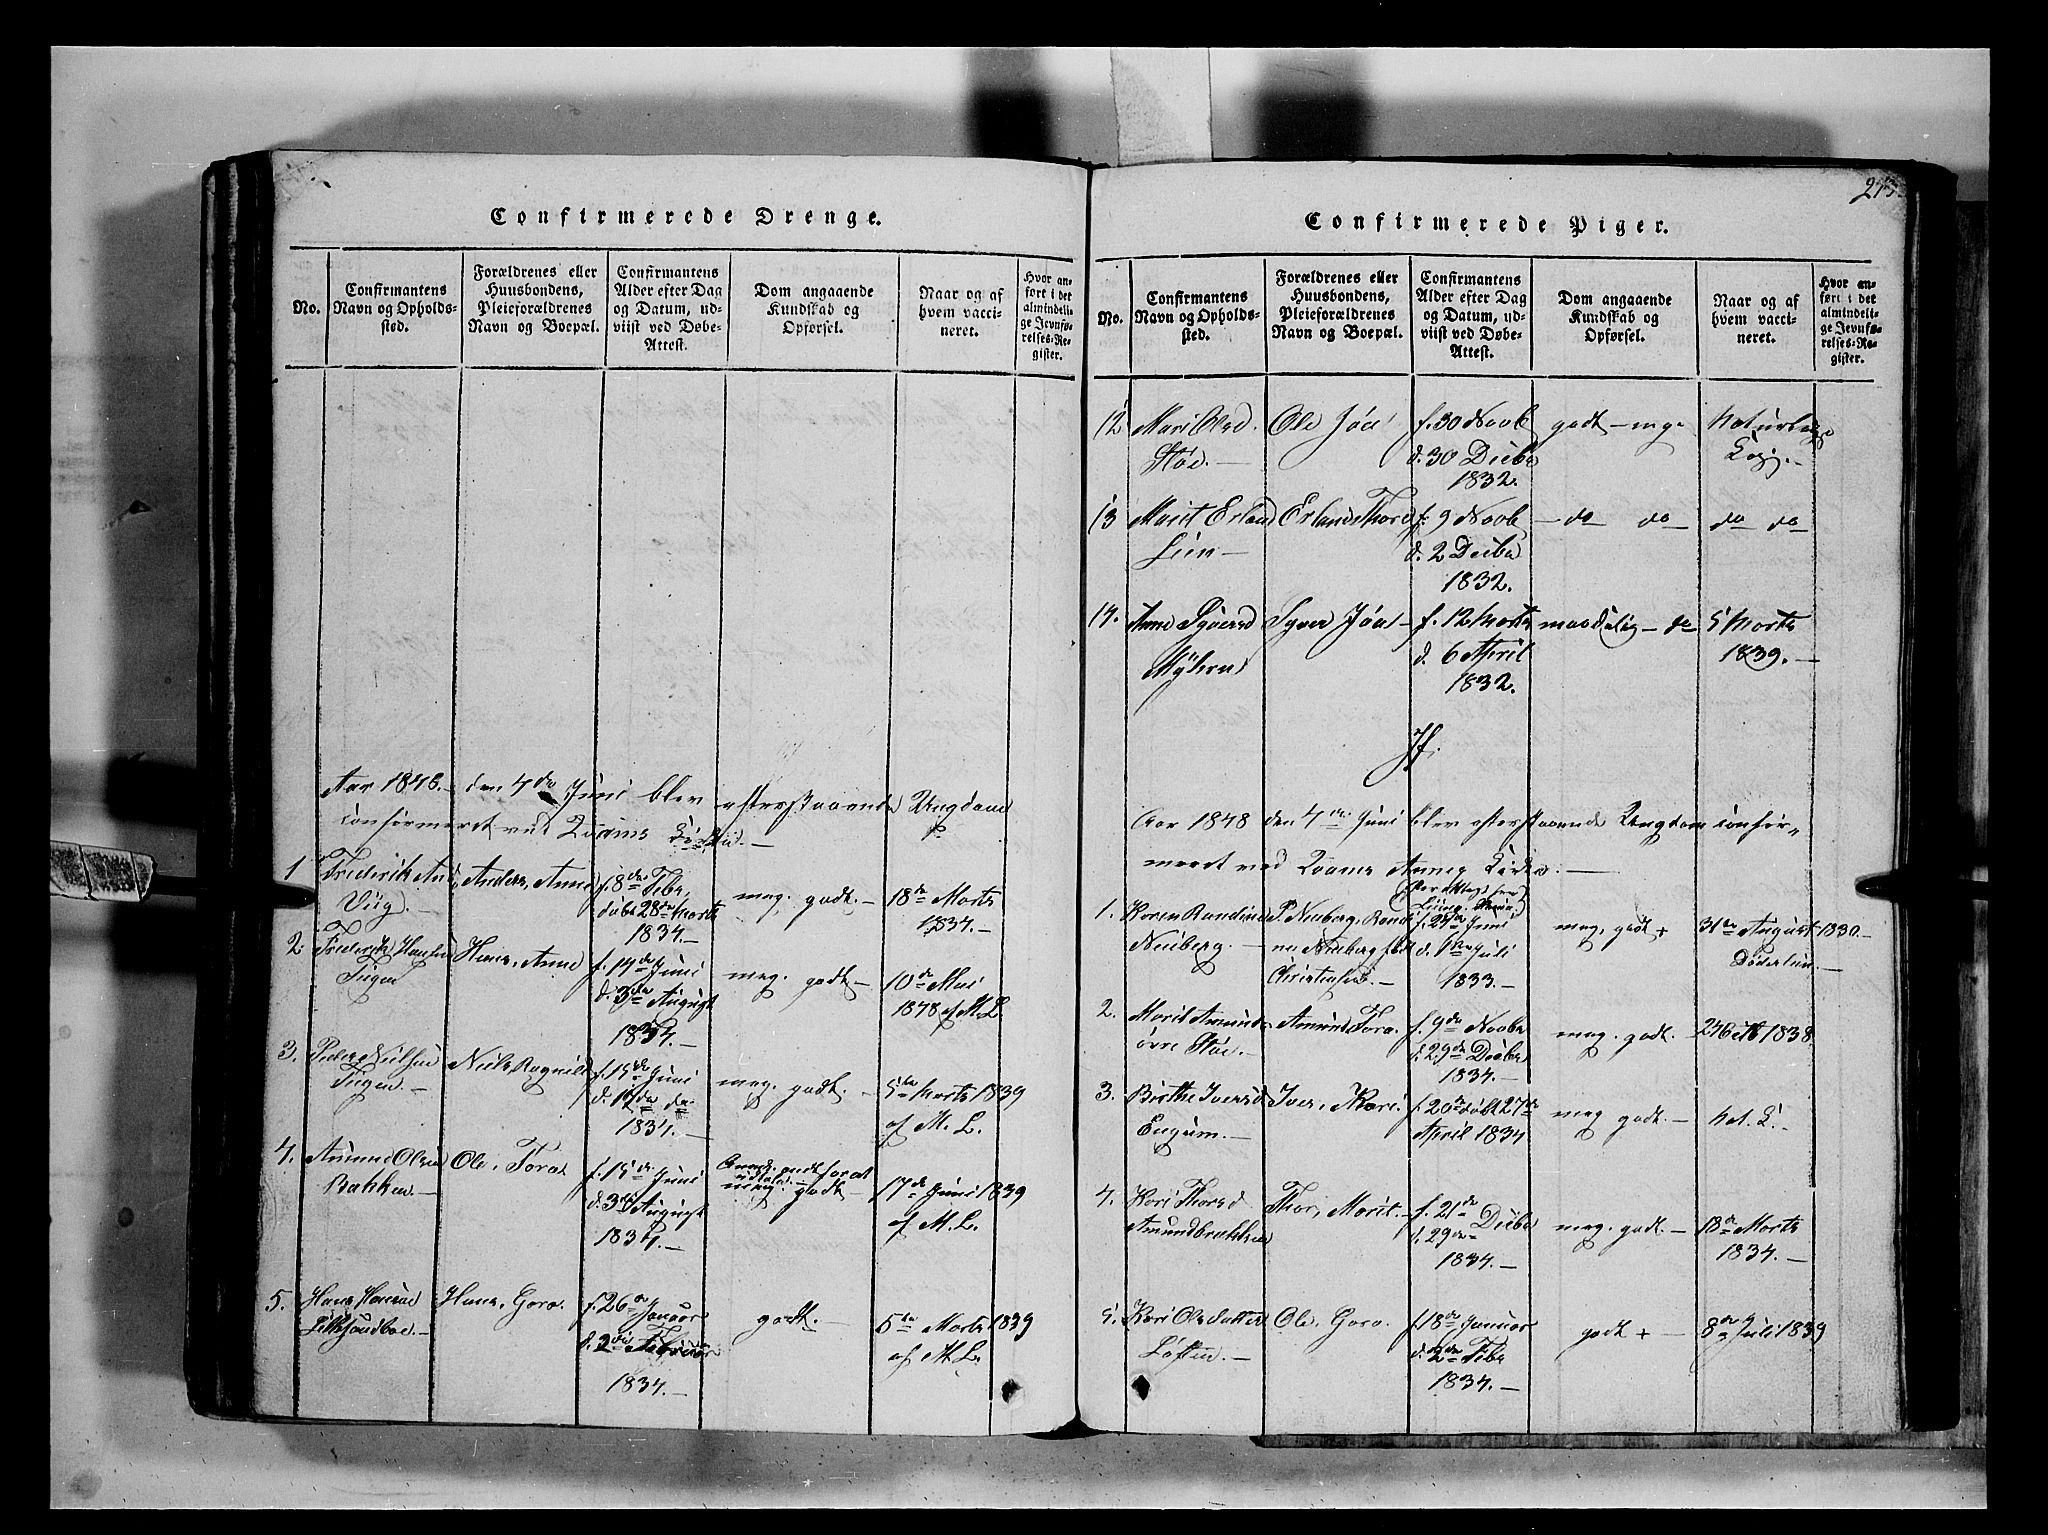 SAH, Fron prestekontor, H/Ha/Hab/L0002: Klokkerbok nr. 2, 1816-1850, s. 273